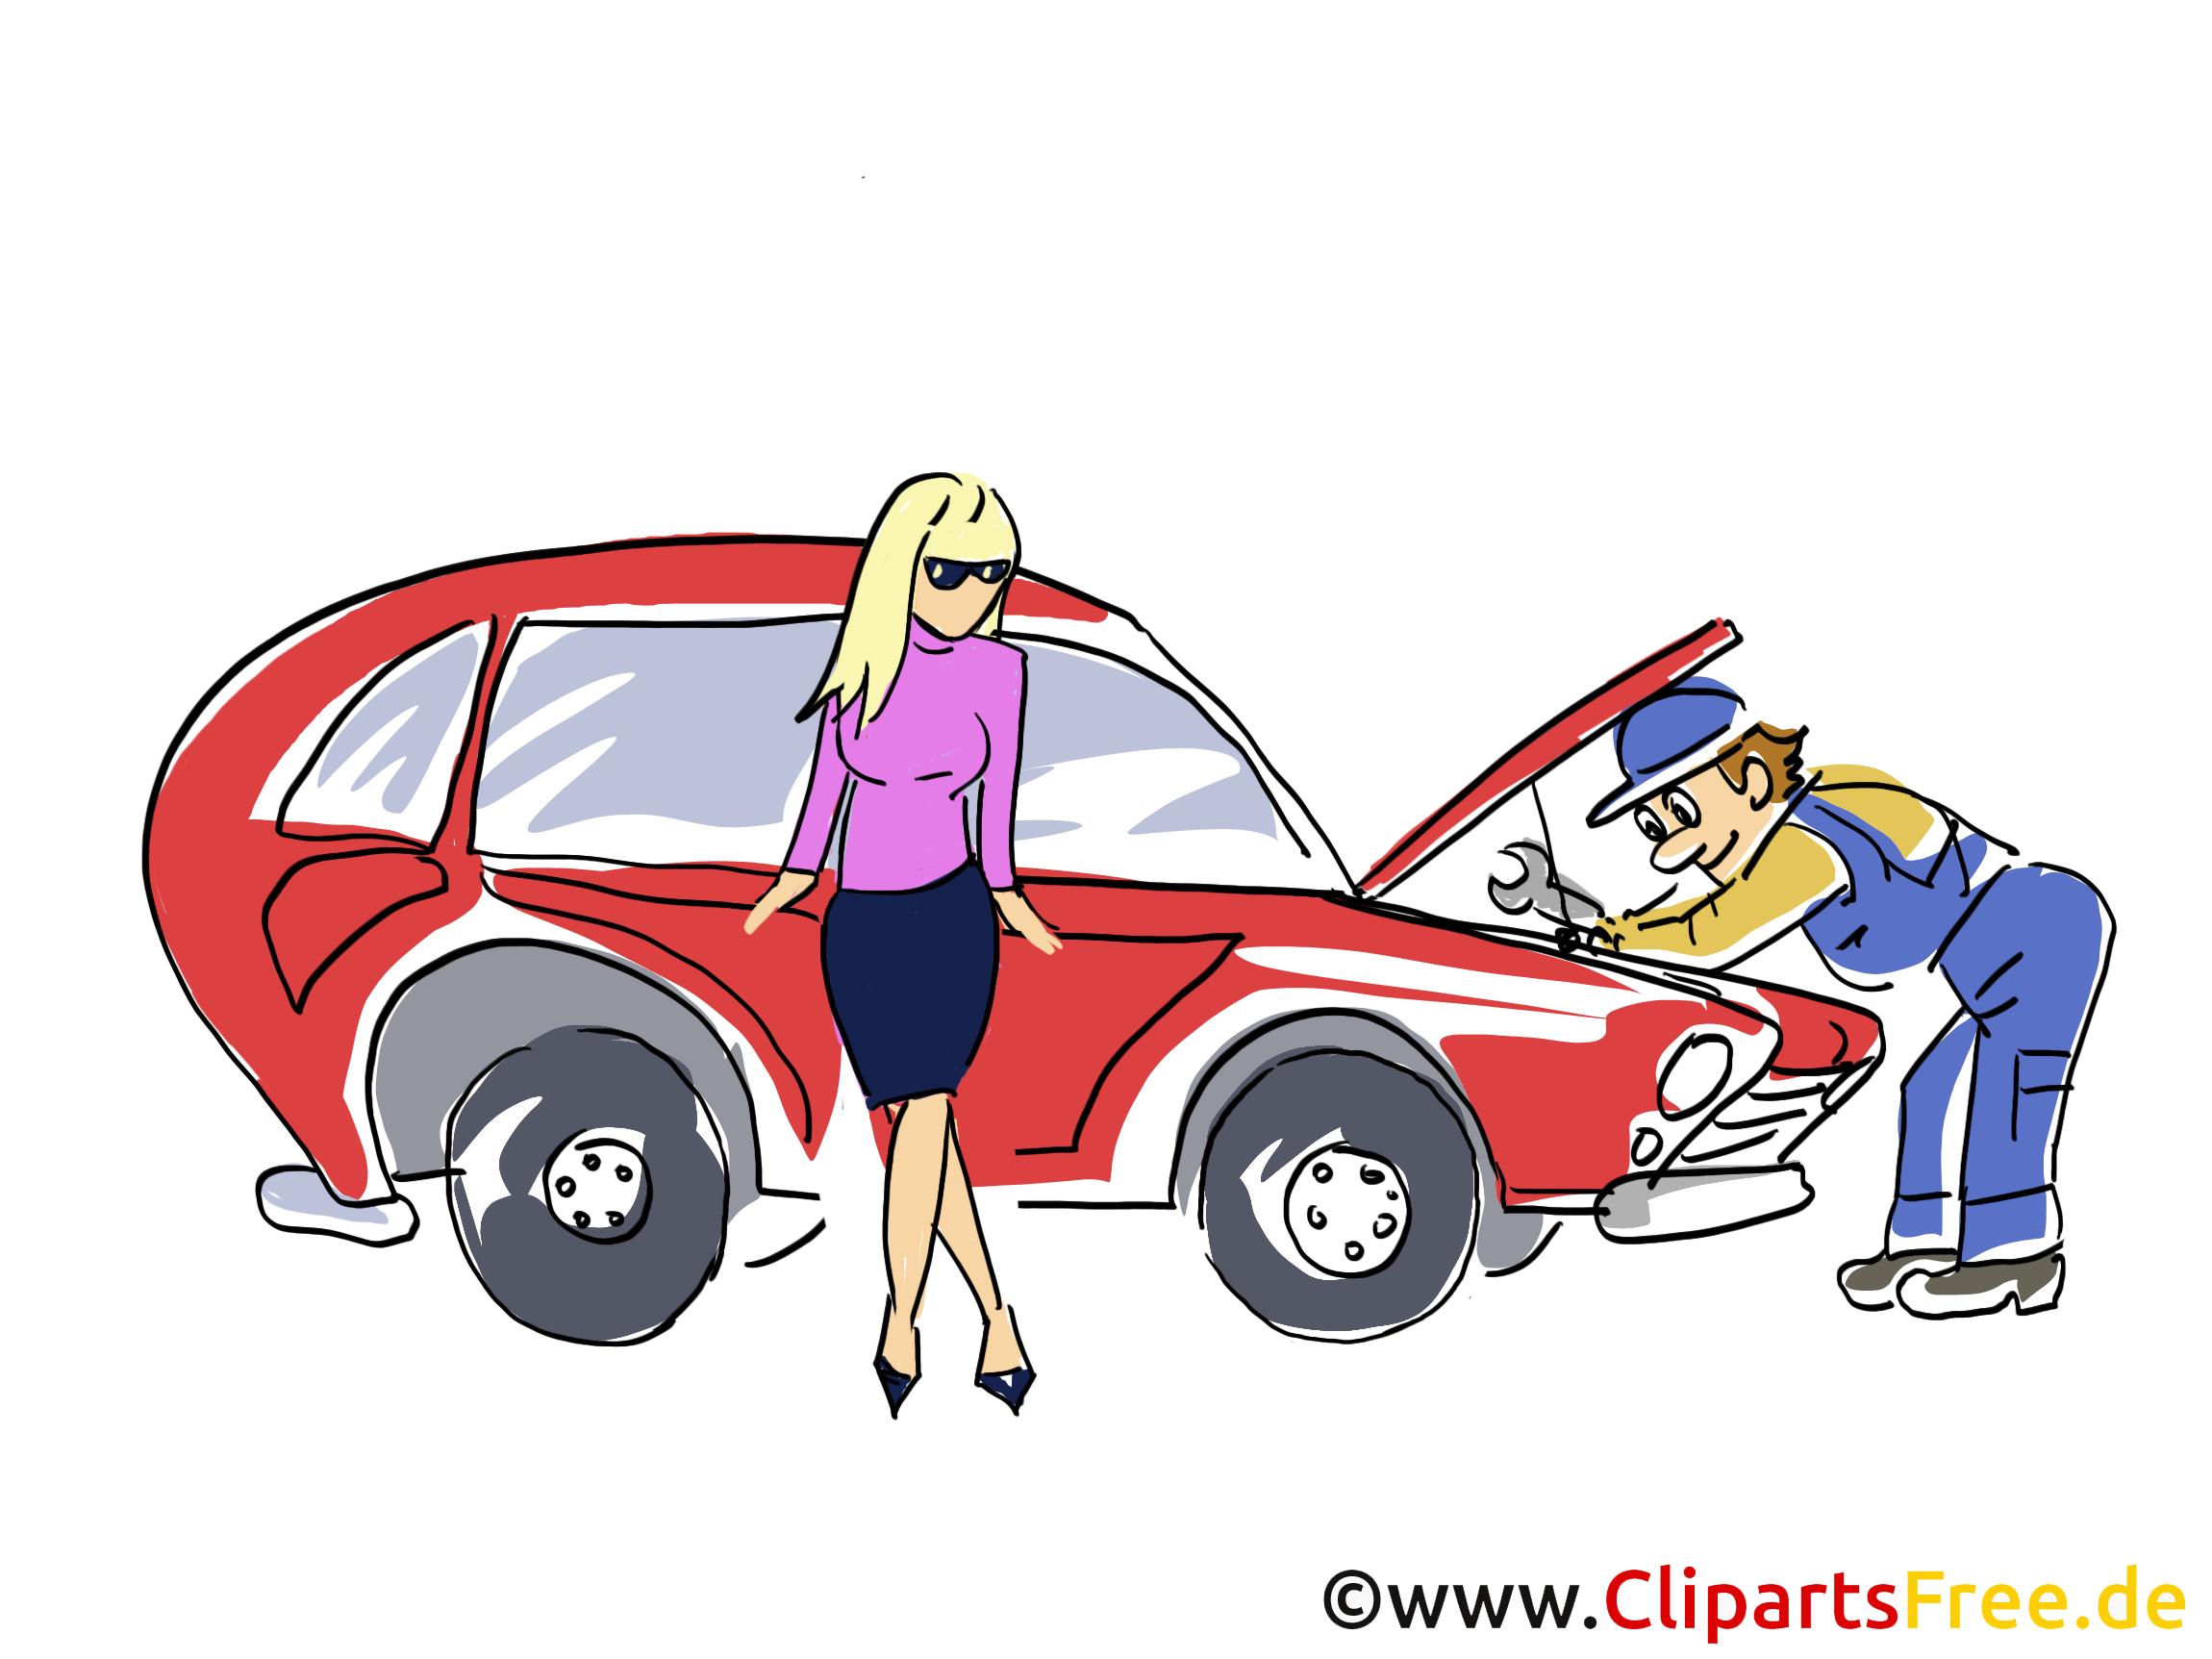 clipart animate auto - photo #38